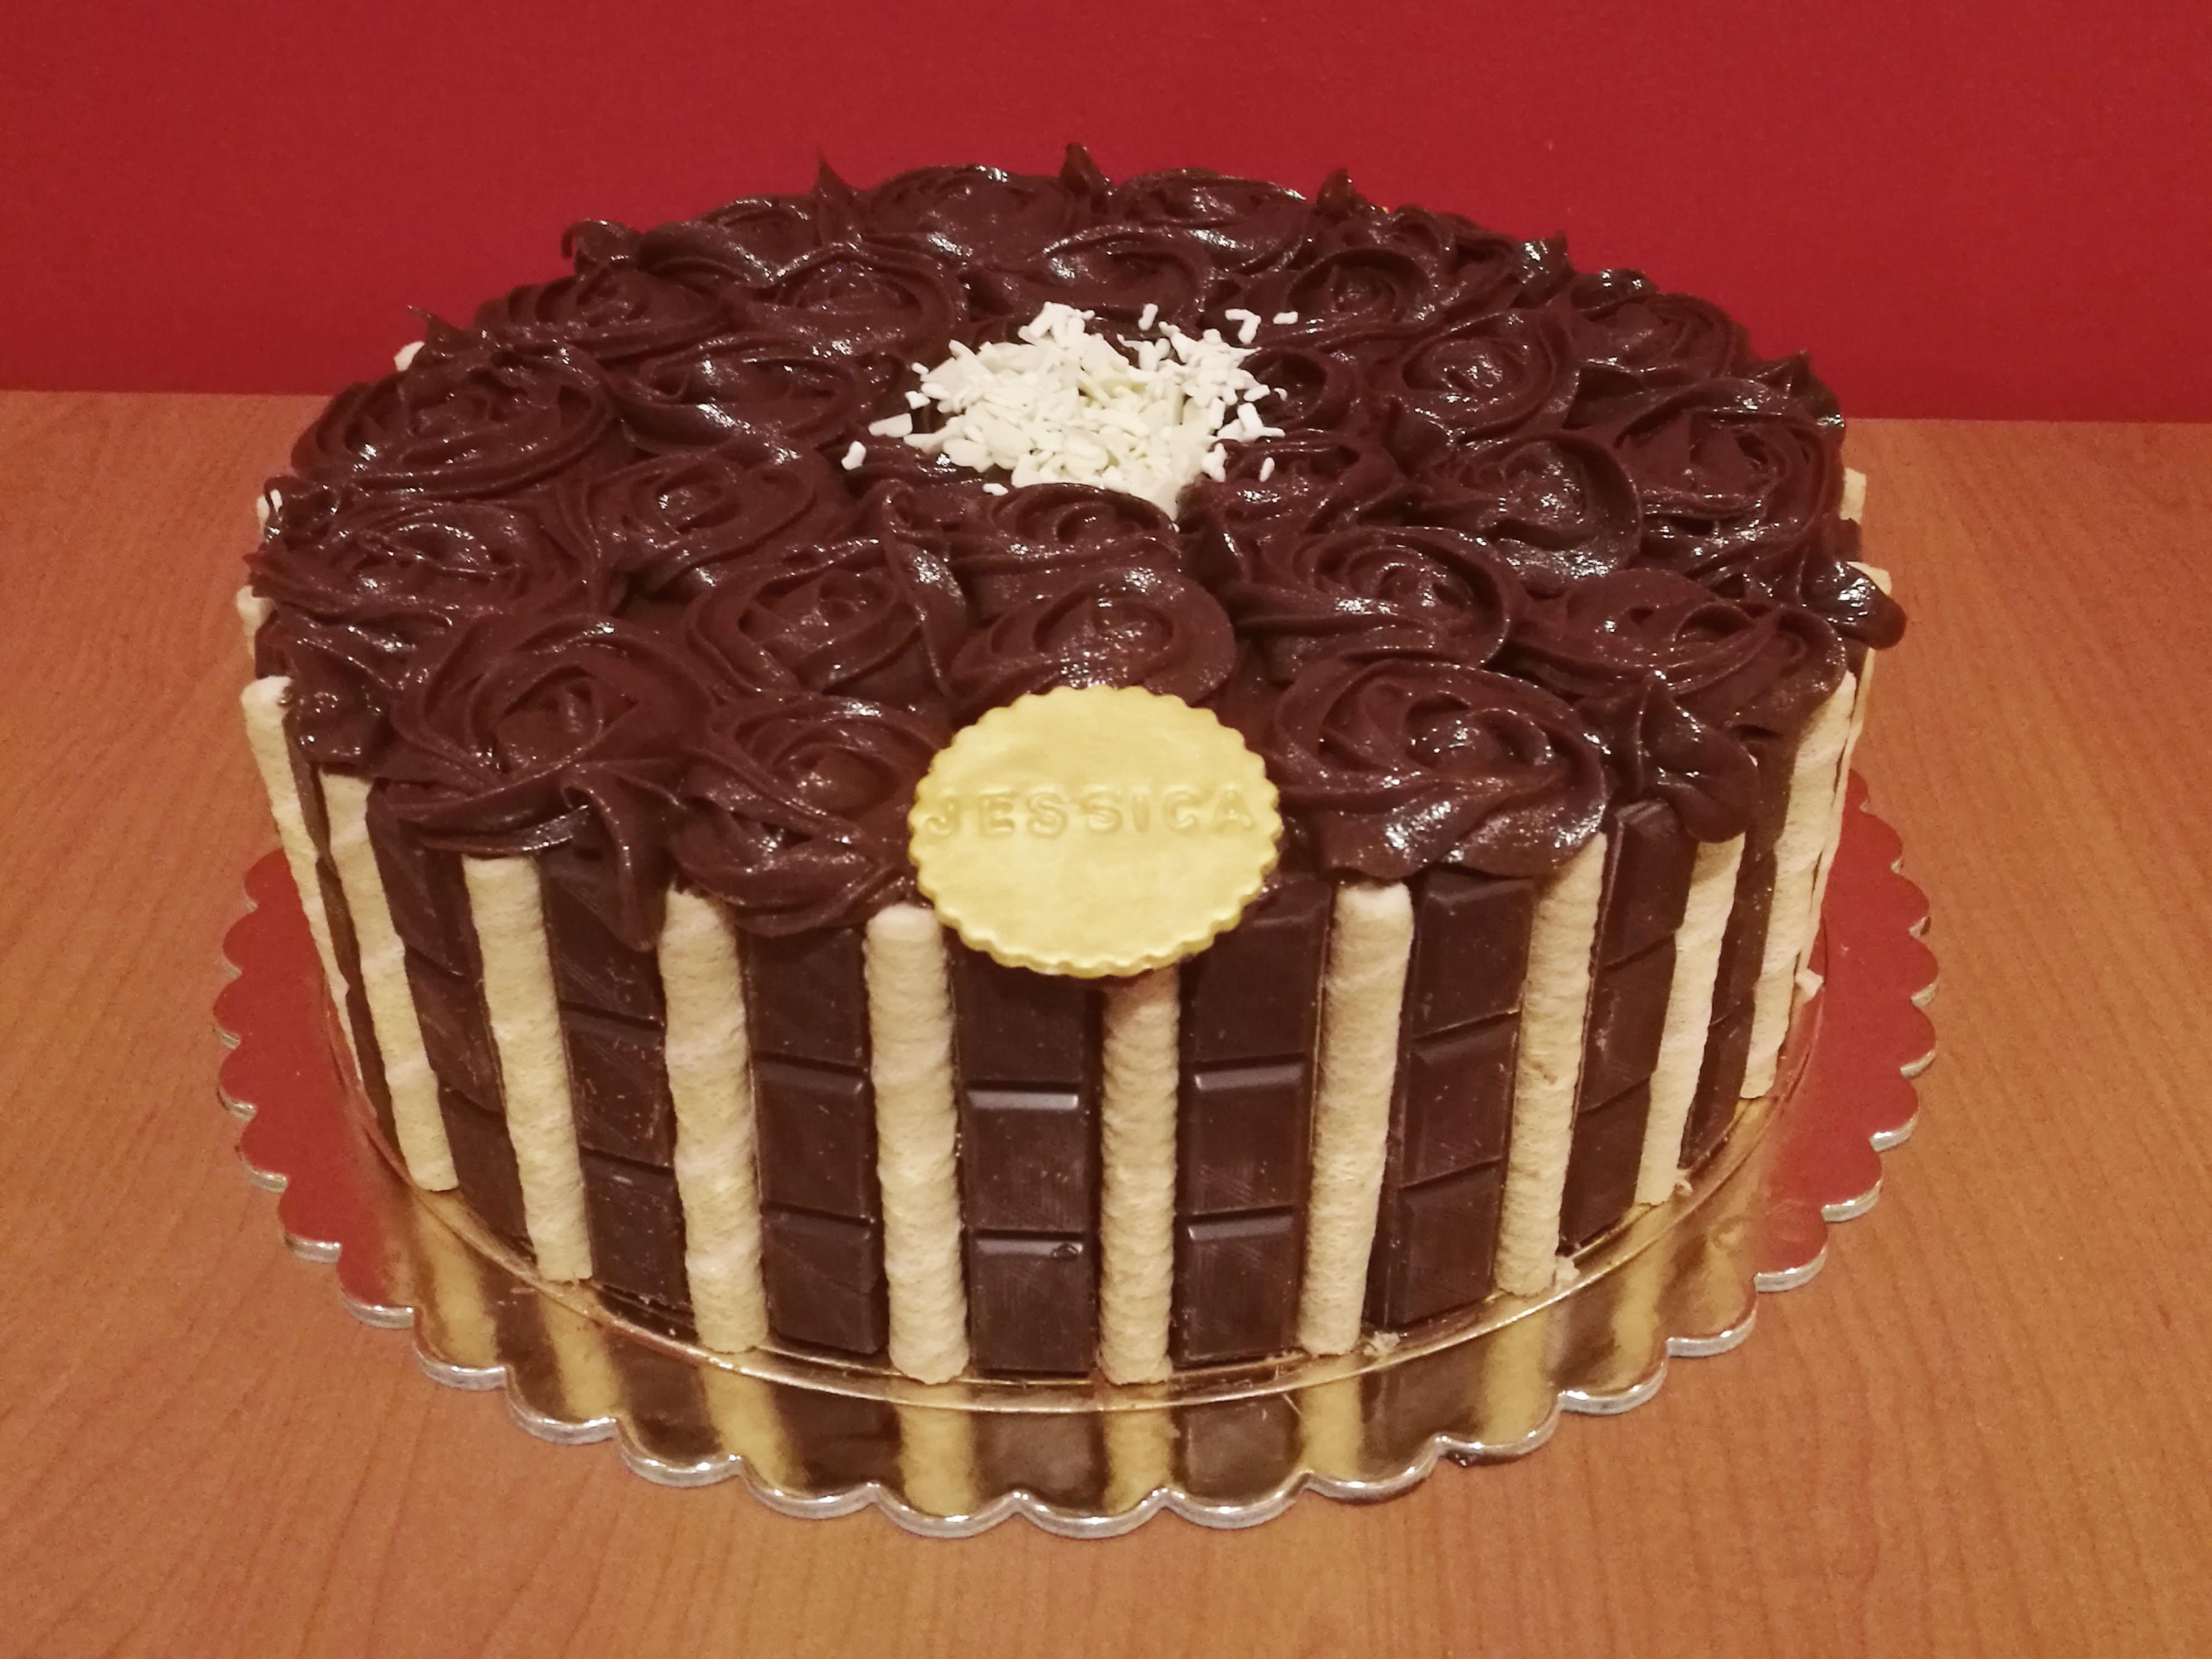 Buffet Natalizio Cookaround : Natale cuginette sul gâteau